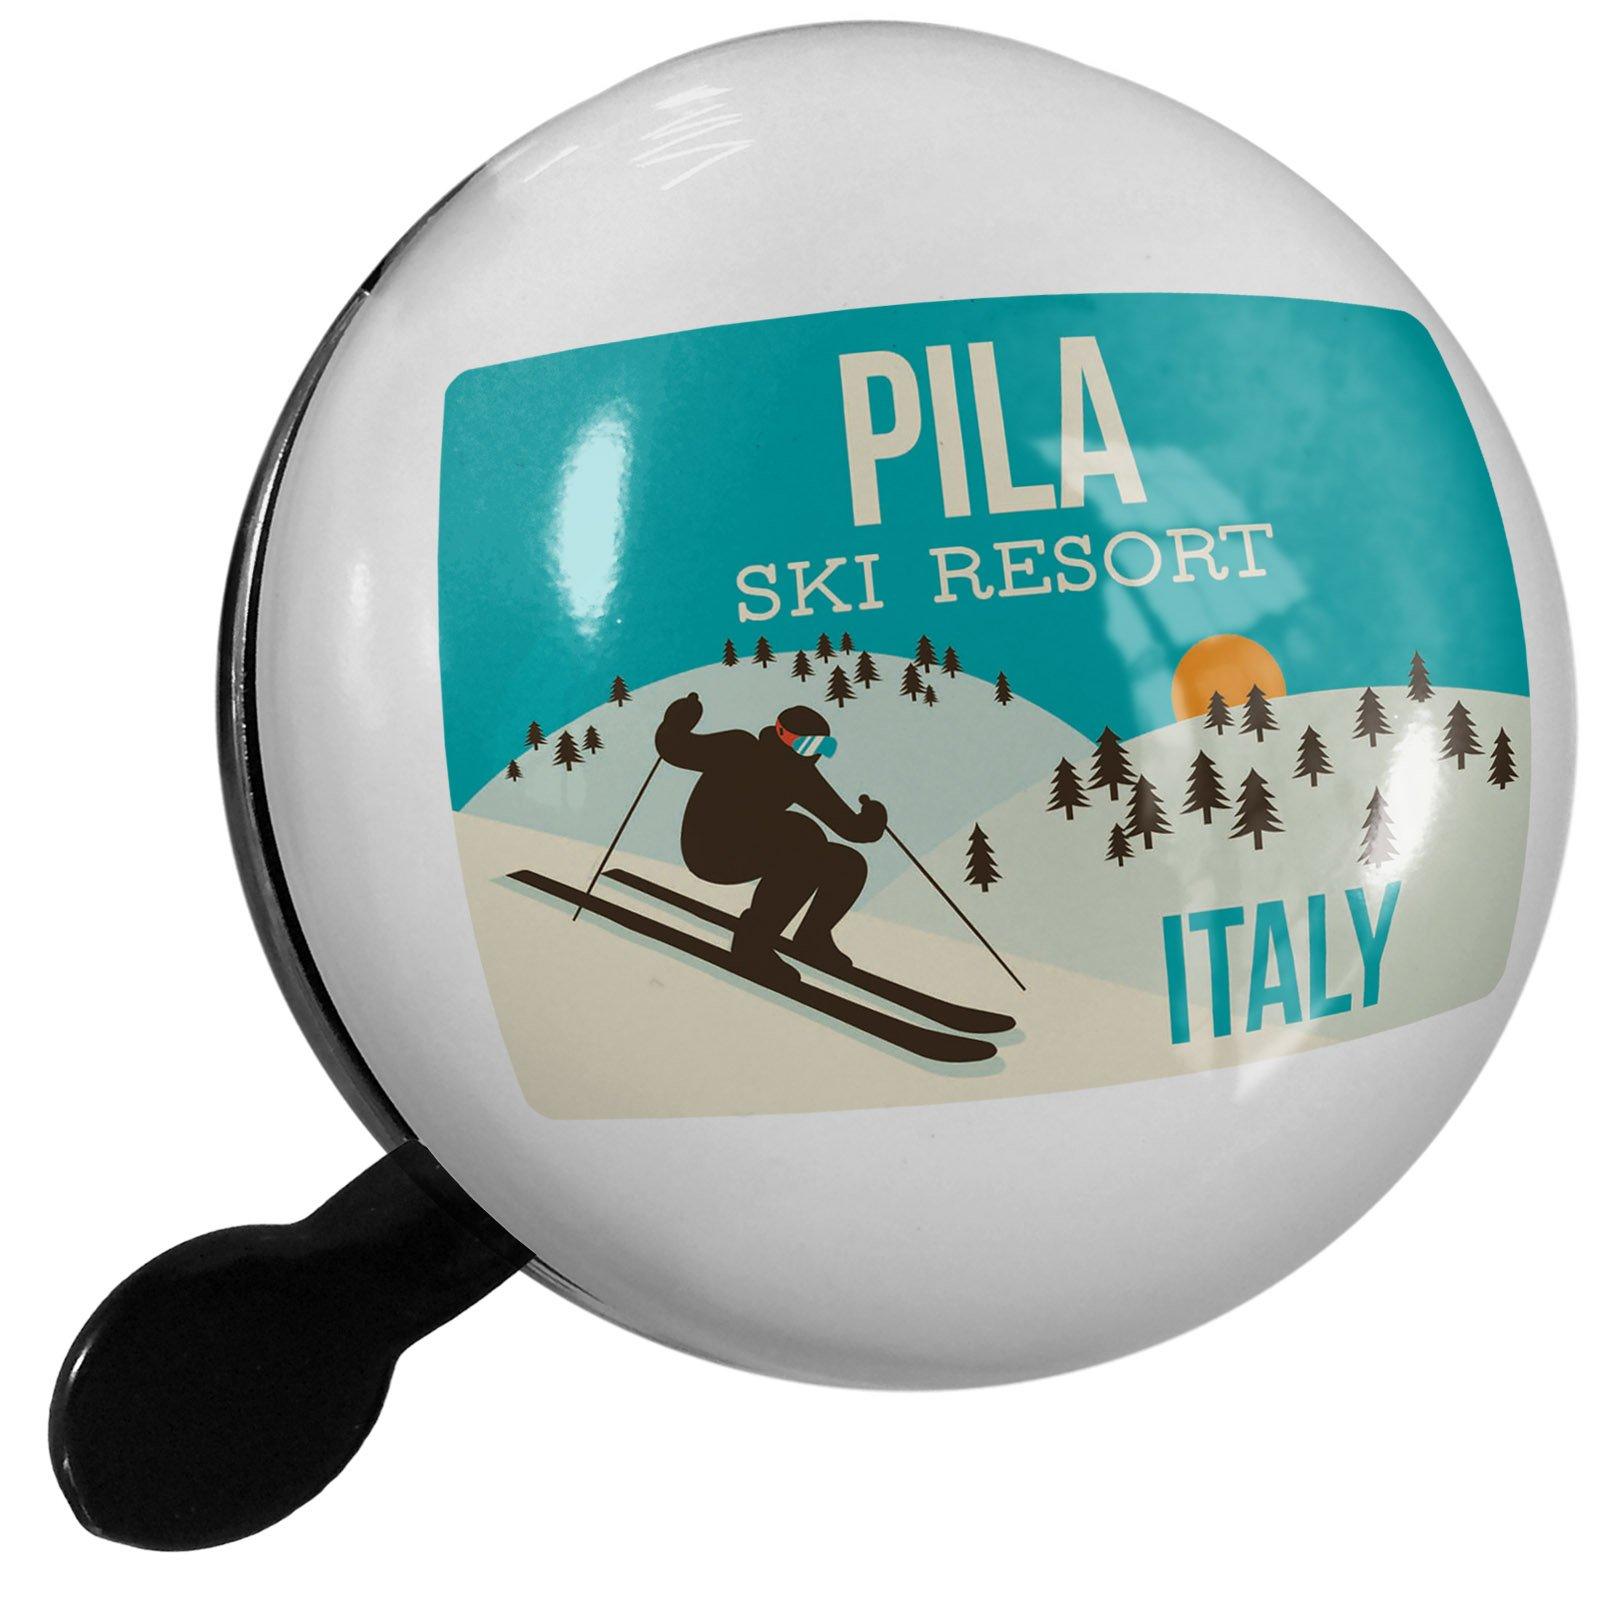 Small Bike Bell Pila Ski Resort - Italy Ski Resort - NEONBLOND